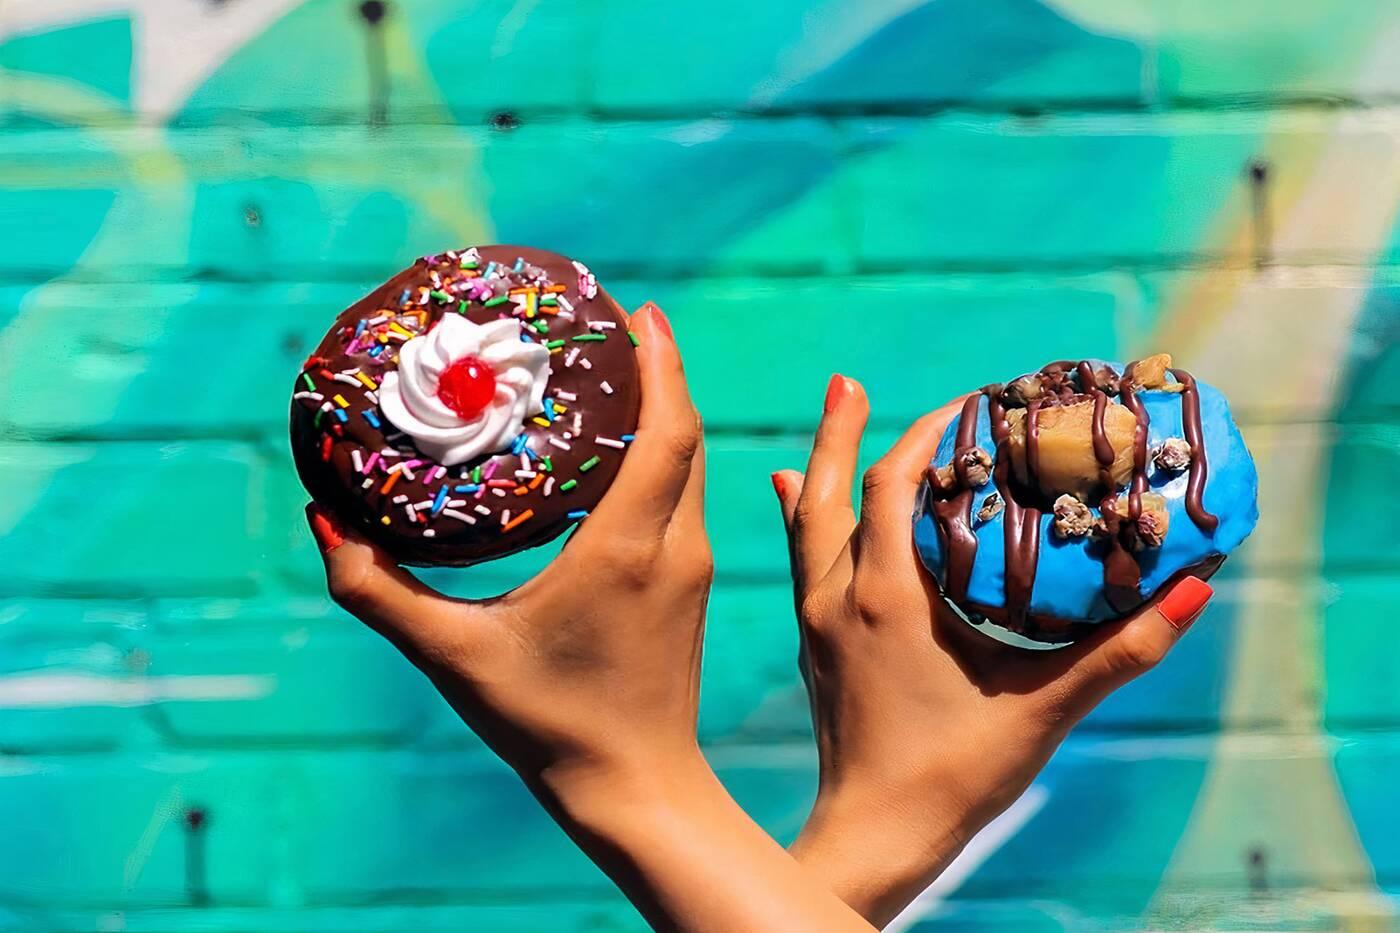 joughnuts doughnuts toronto